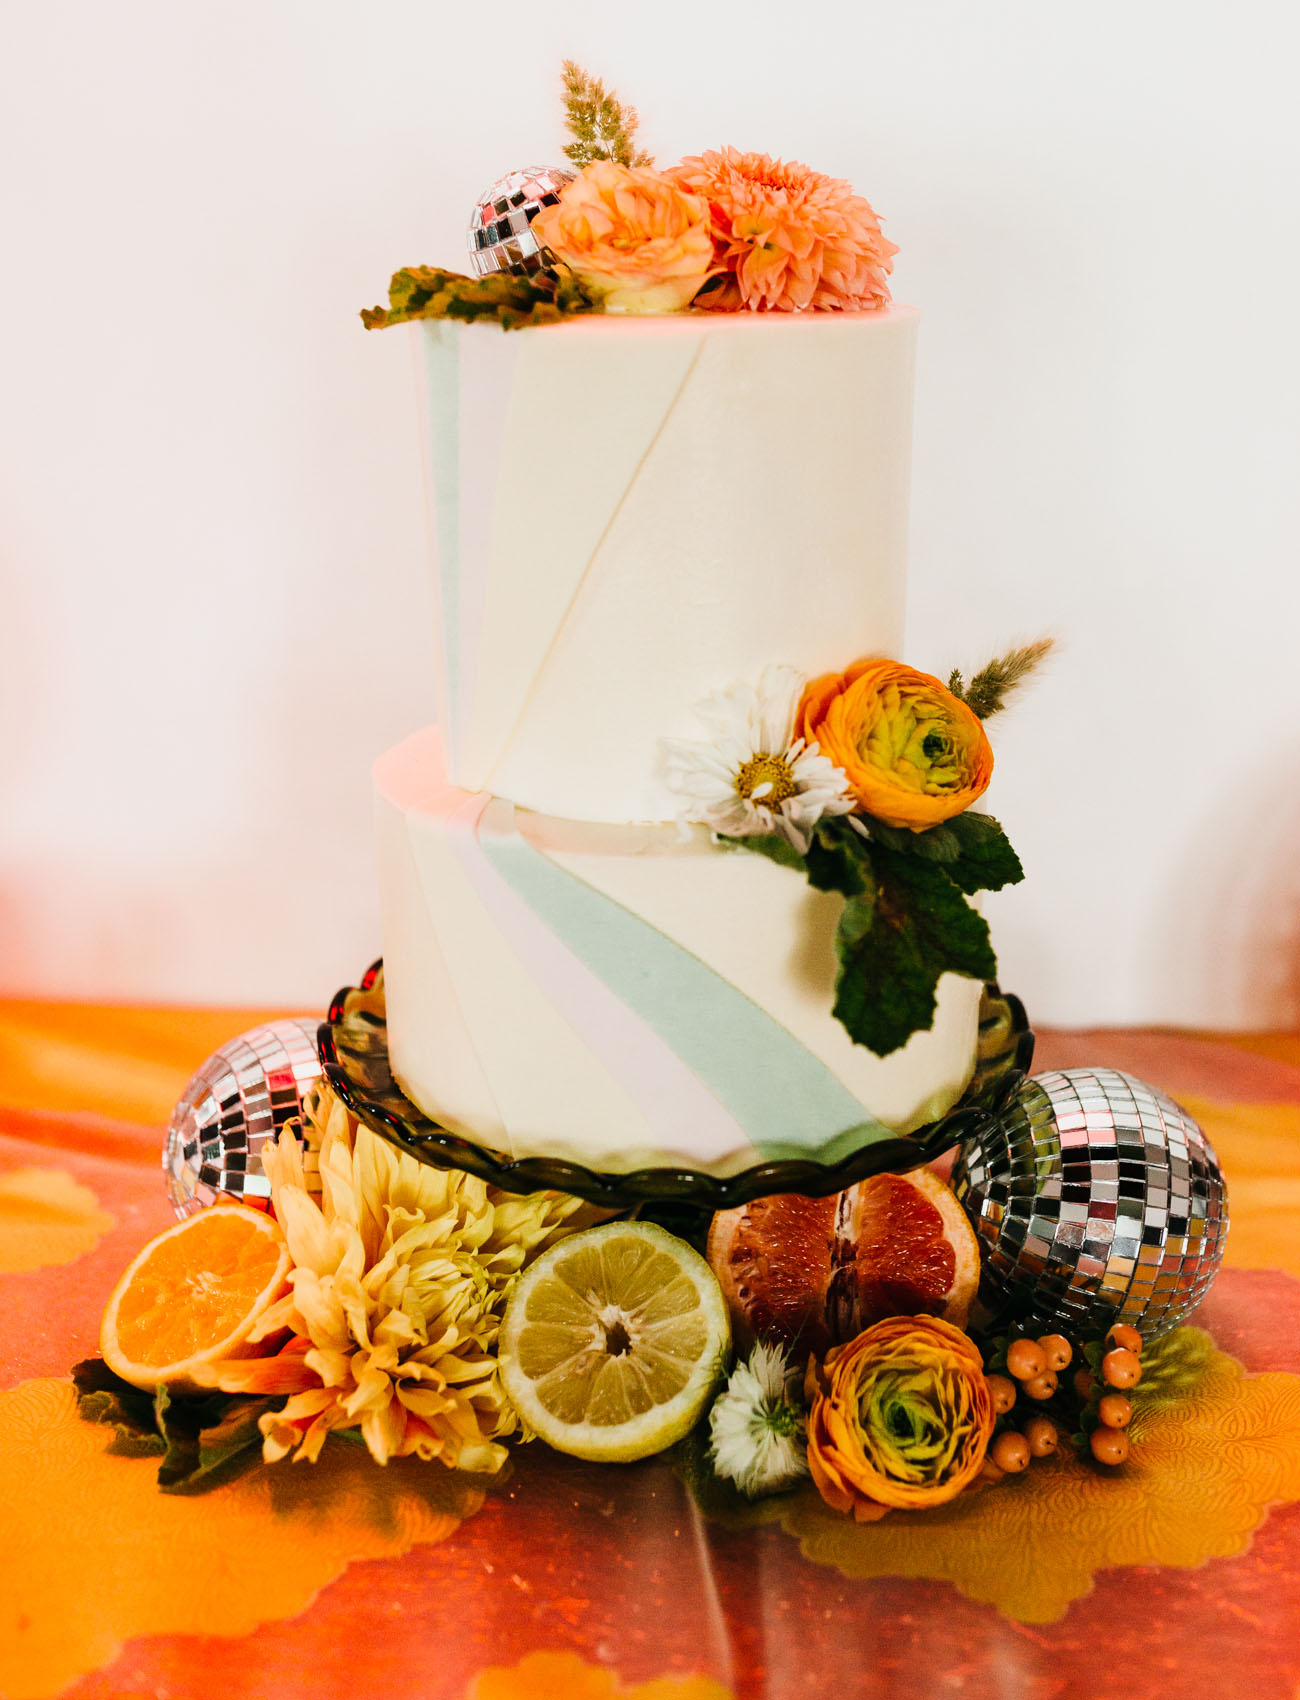 simple yet stylish geometric cake design